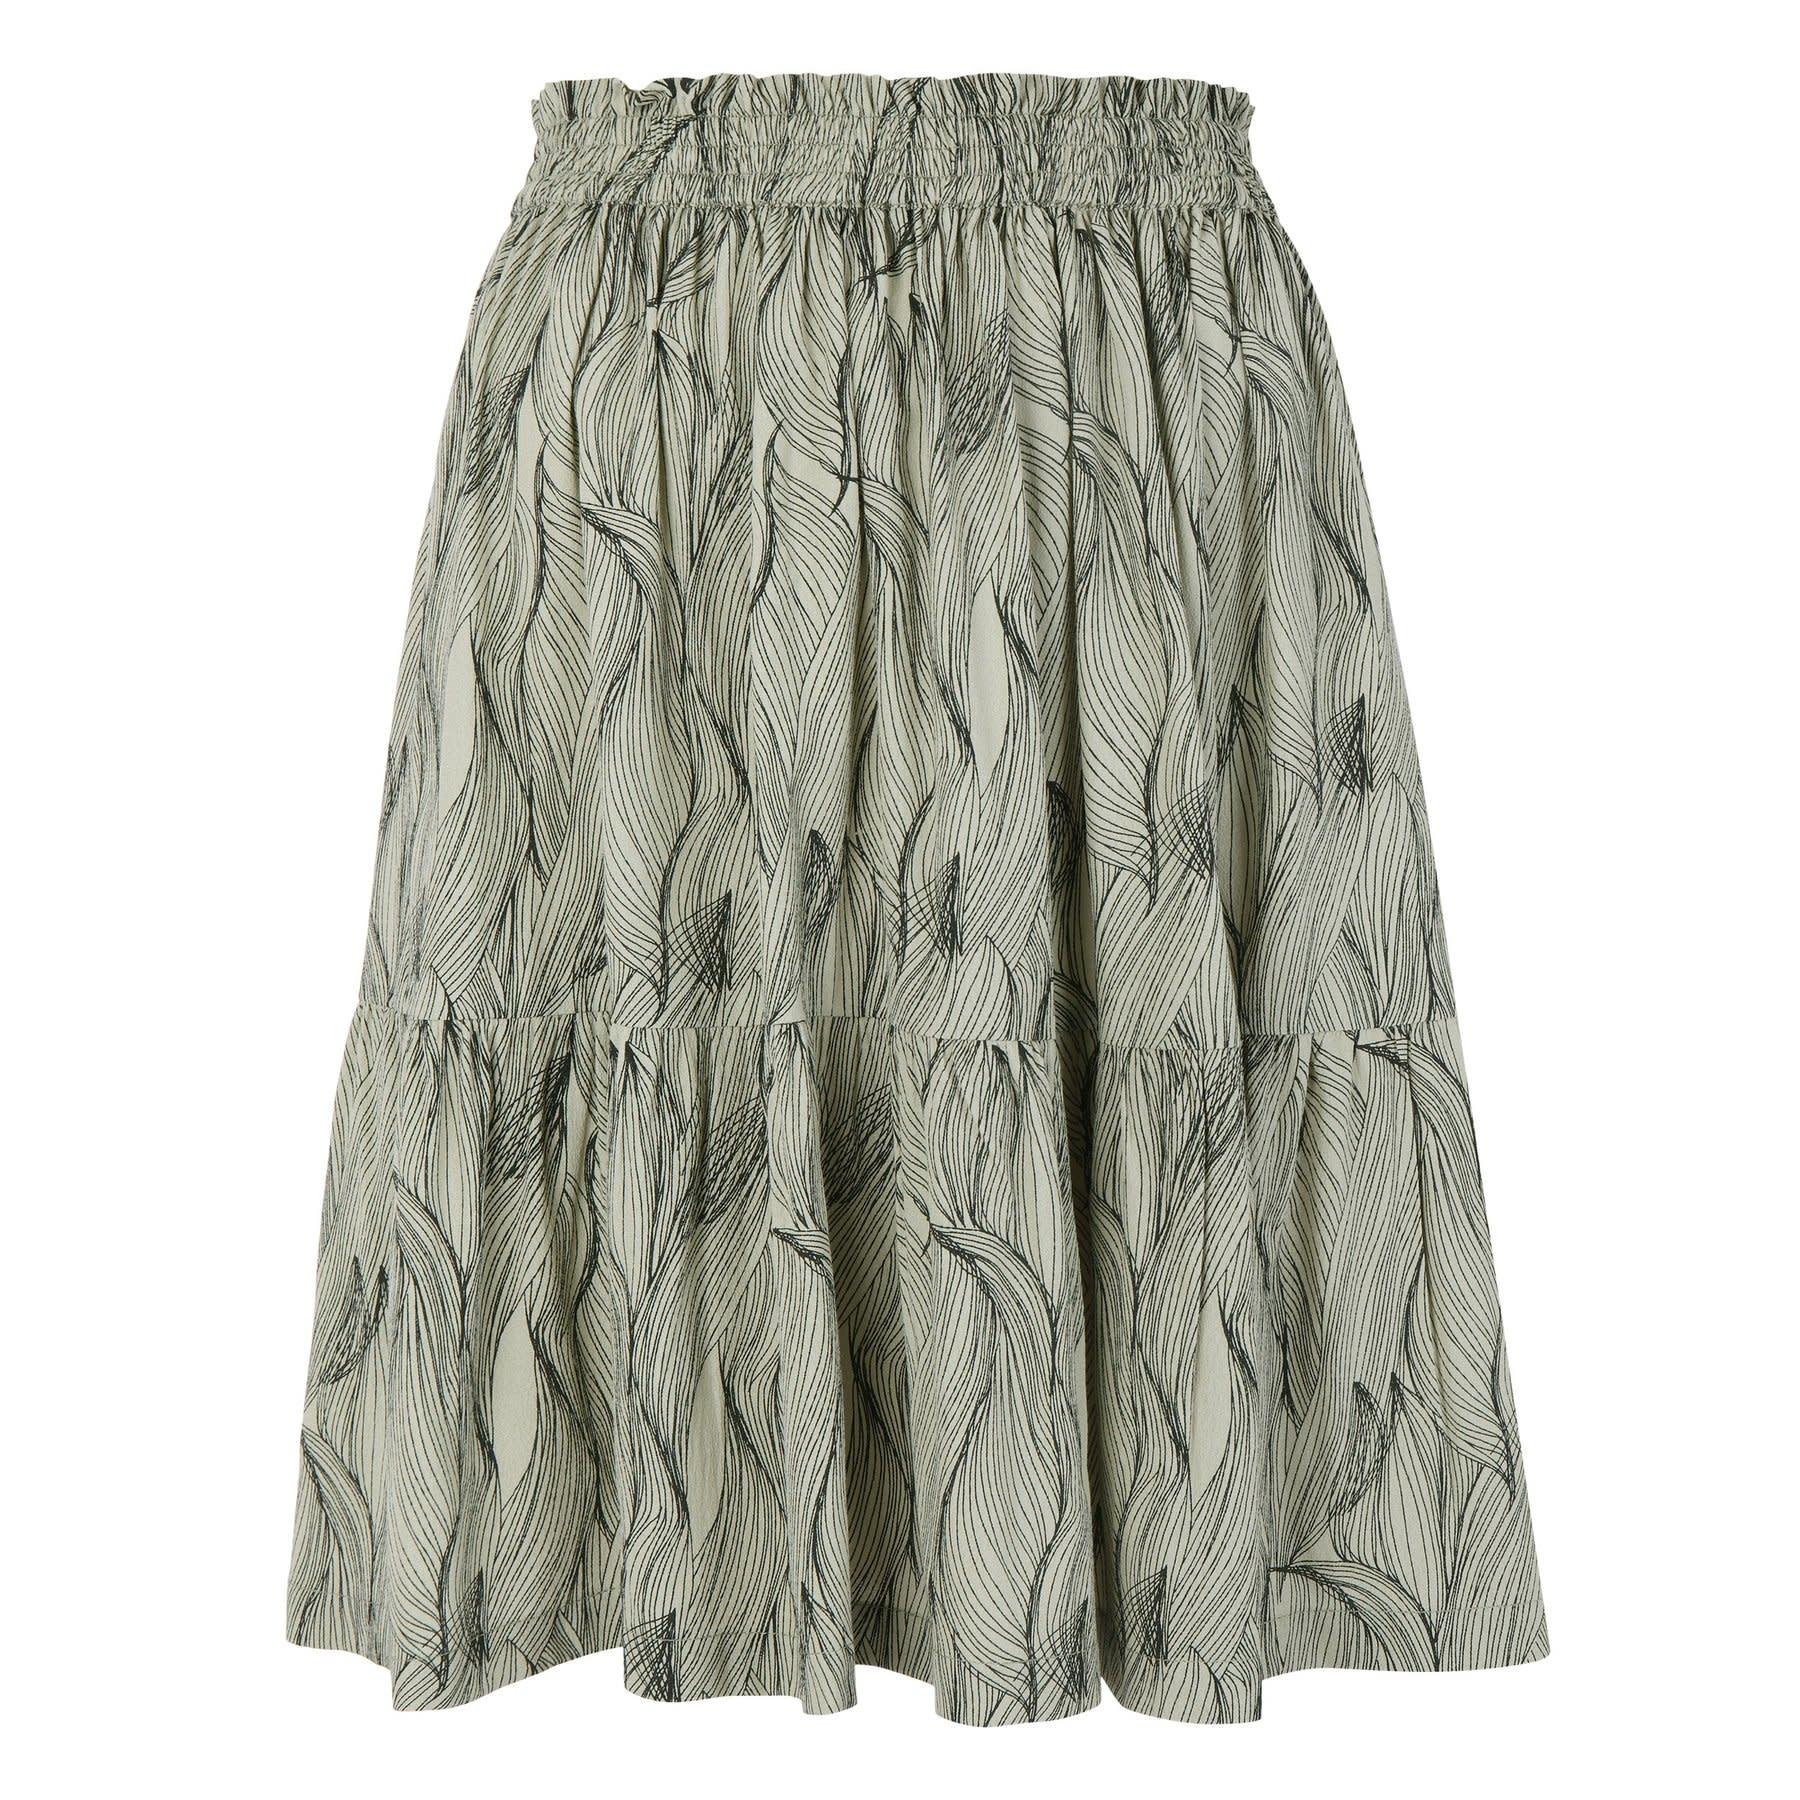 Soft Rebels, Move HW Skirt, Mint KUIF Fashion & Hair